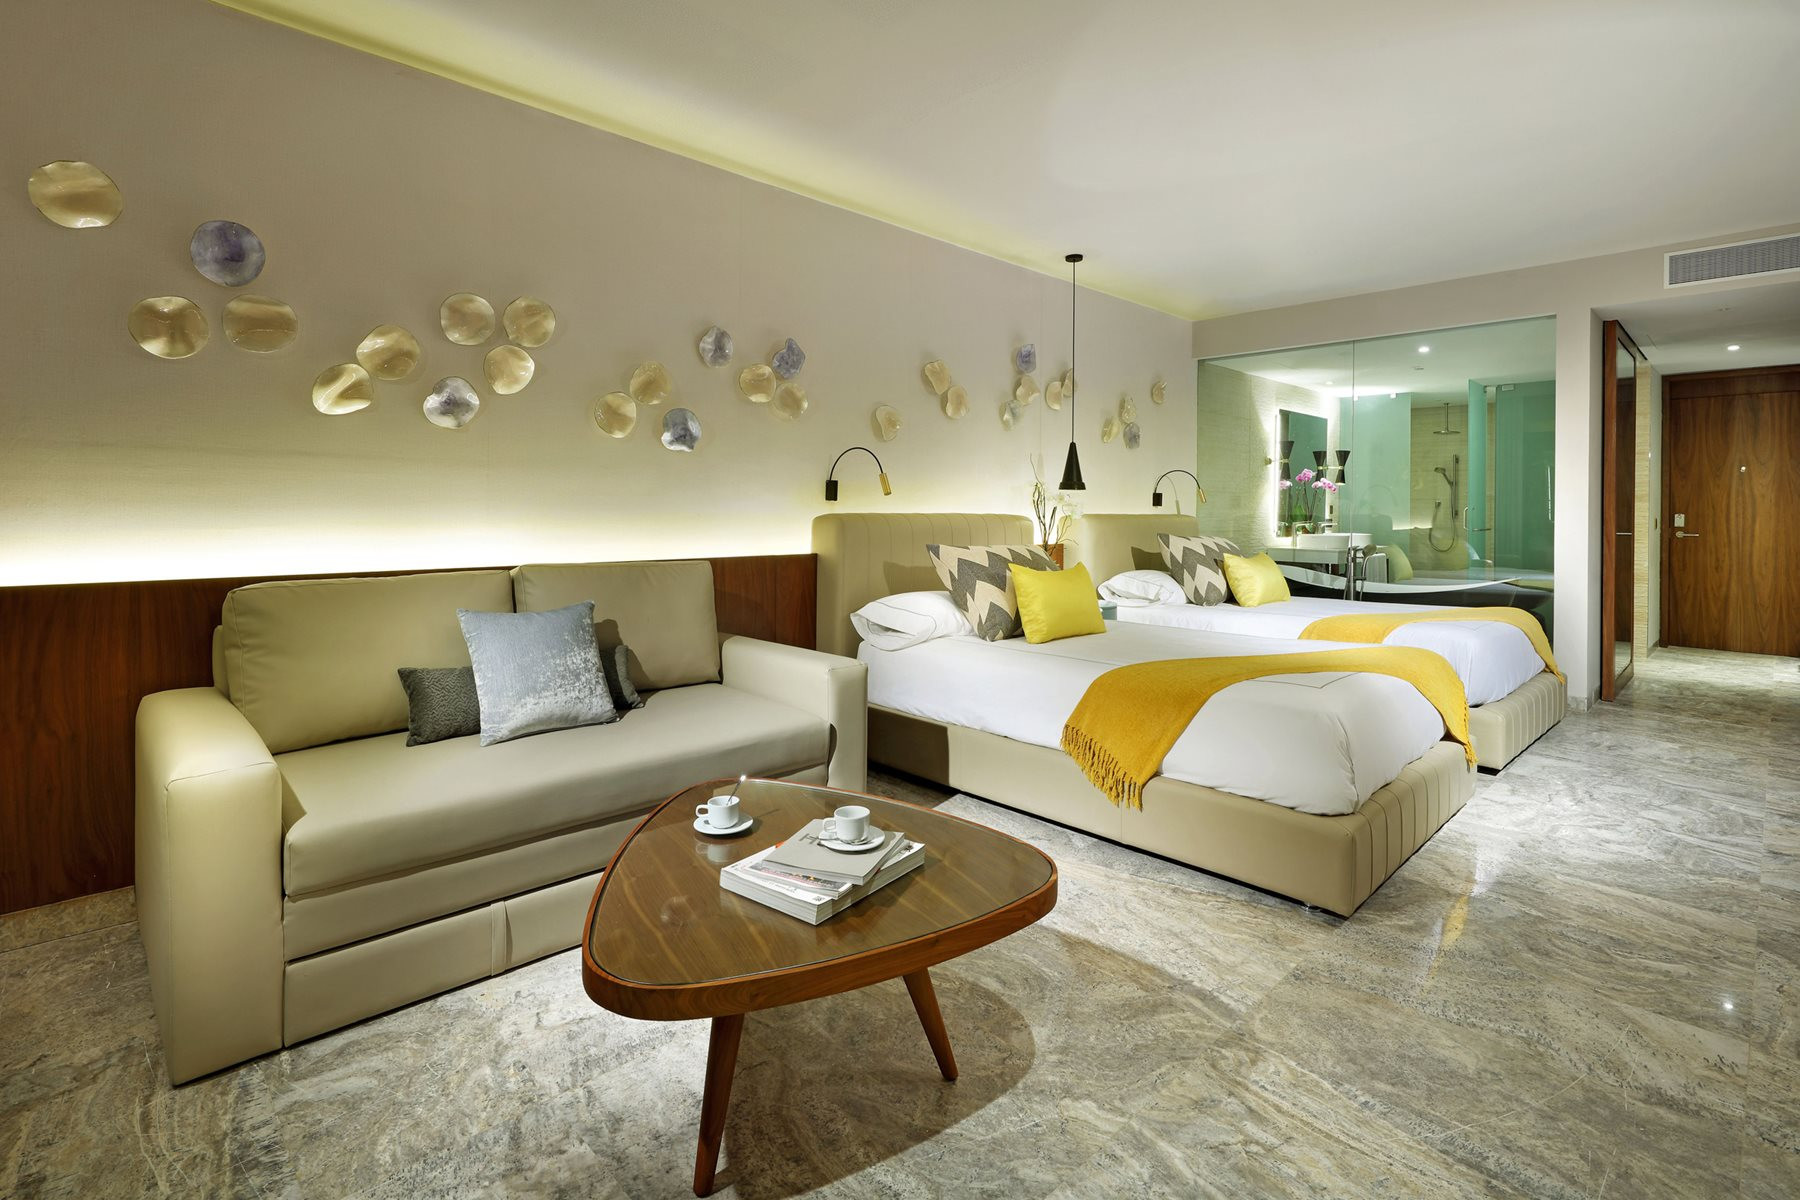 universal hardwood flooring toronto of grand palladium costa mujeres resort spa cancun transat within cun grand palladium costa mujeres room junior suite 001 aspx